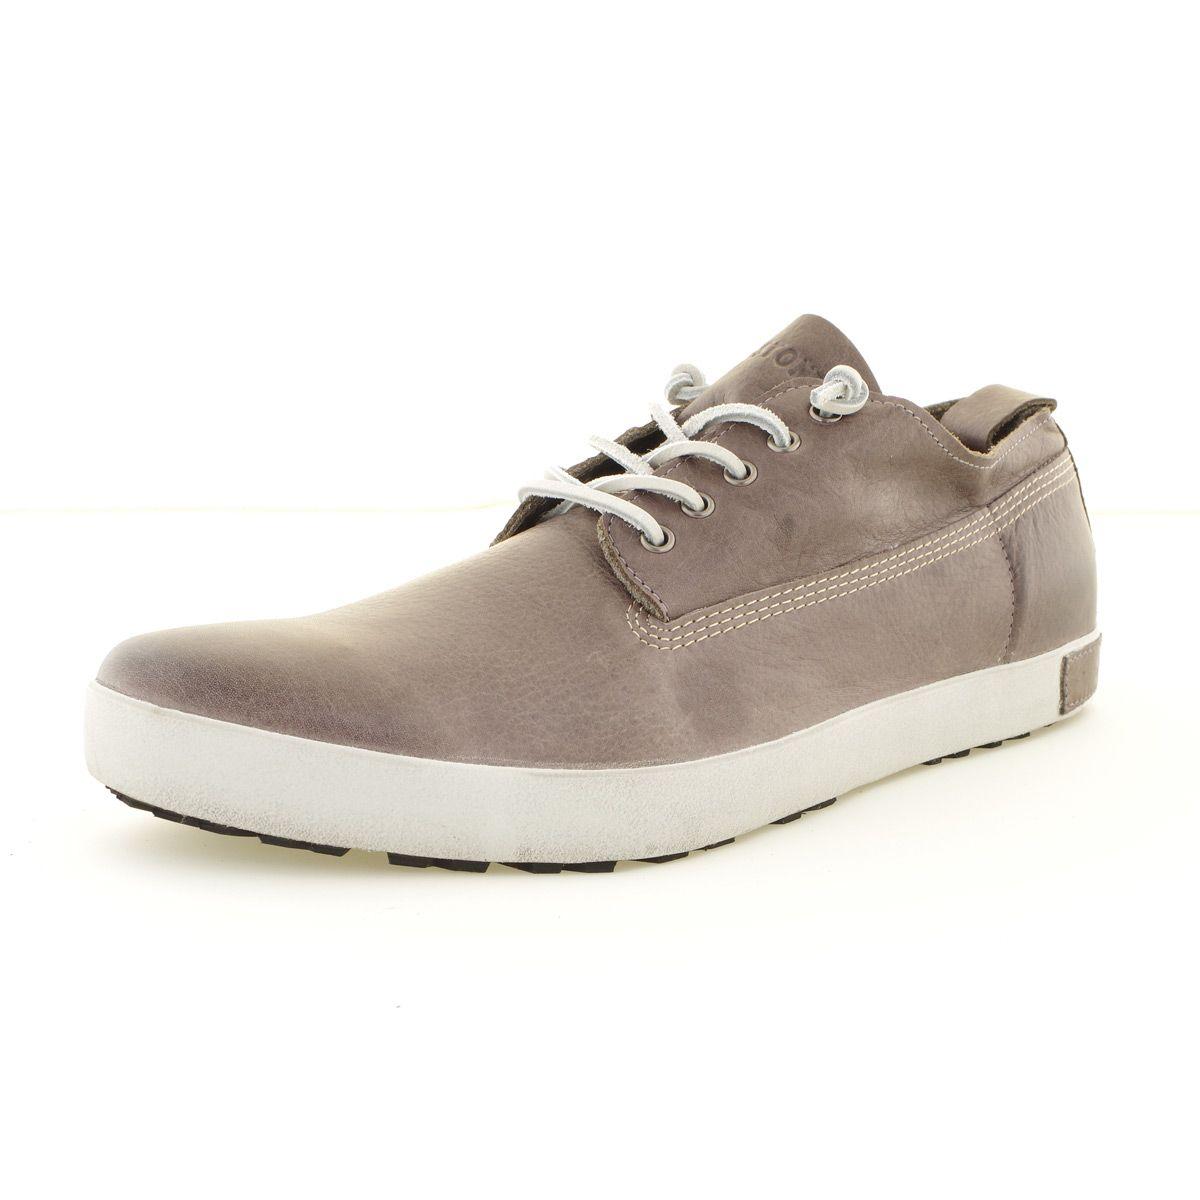 chaussures sneaker gris anthracite grande taille du 46 au. Black Bedroom Furniture Sets. Home Design Ideas